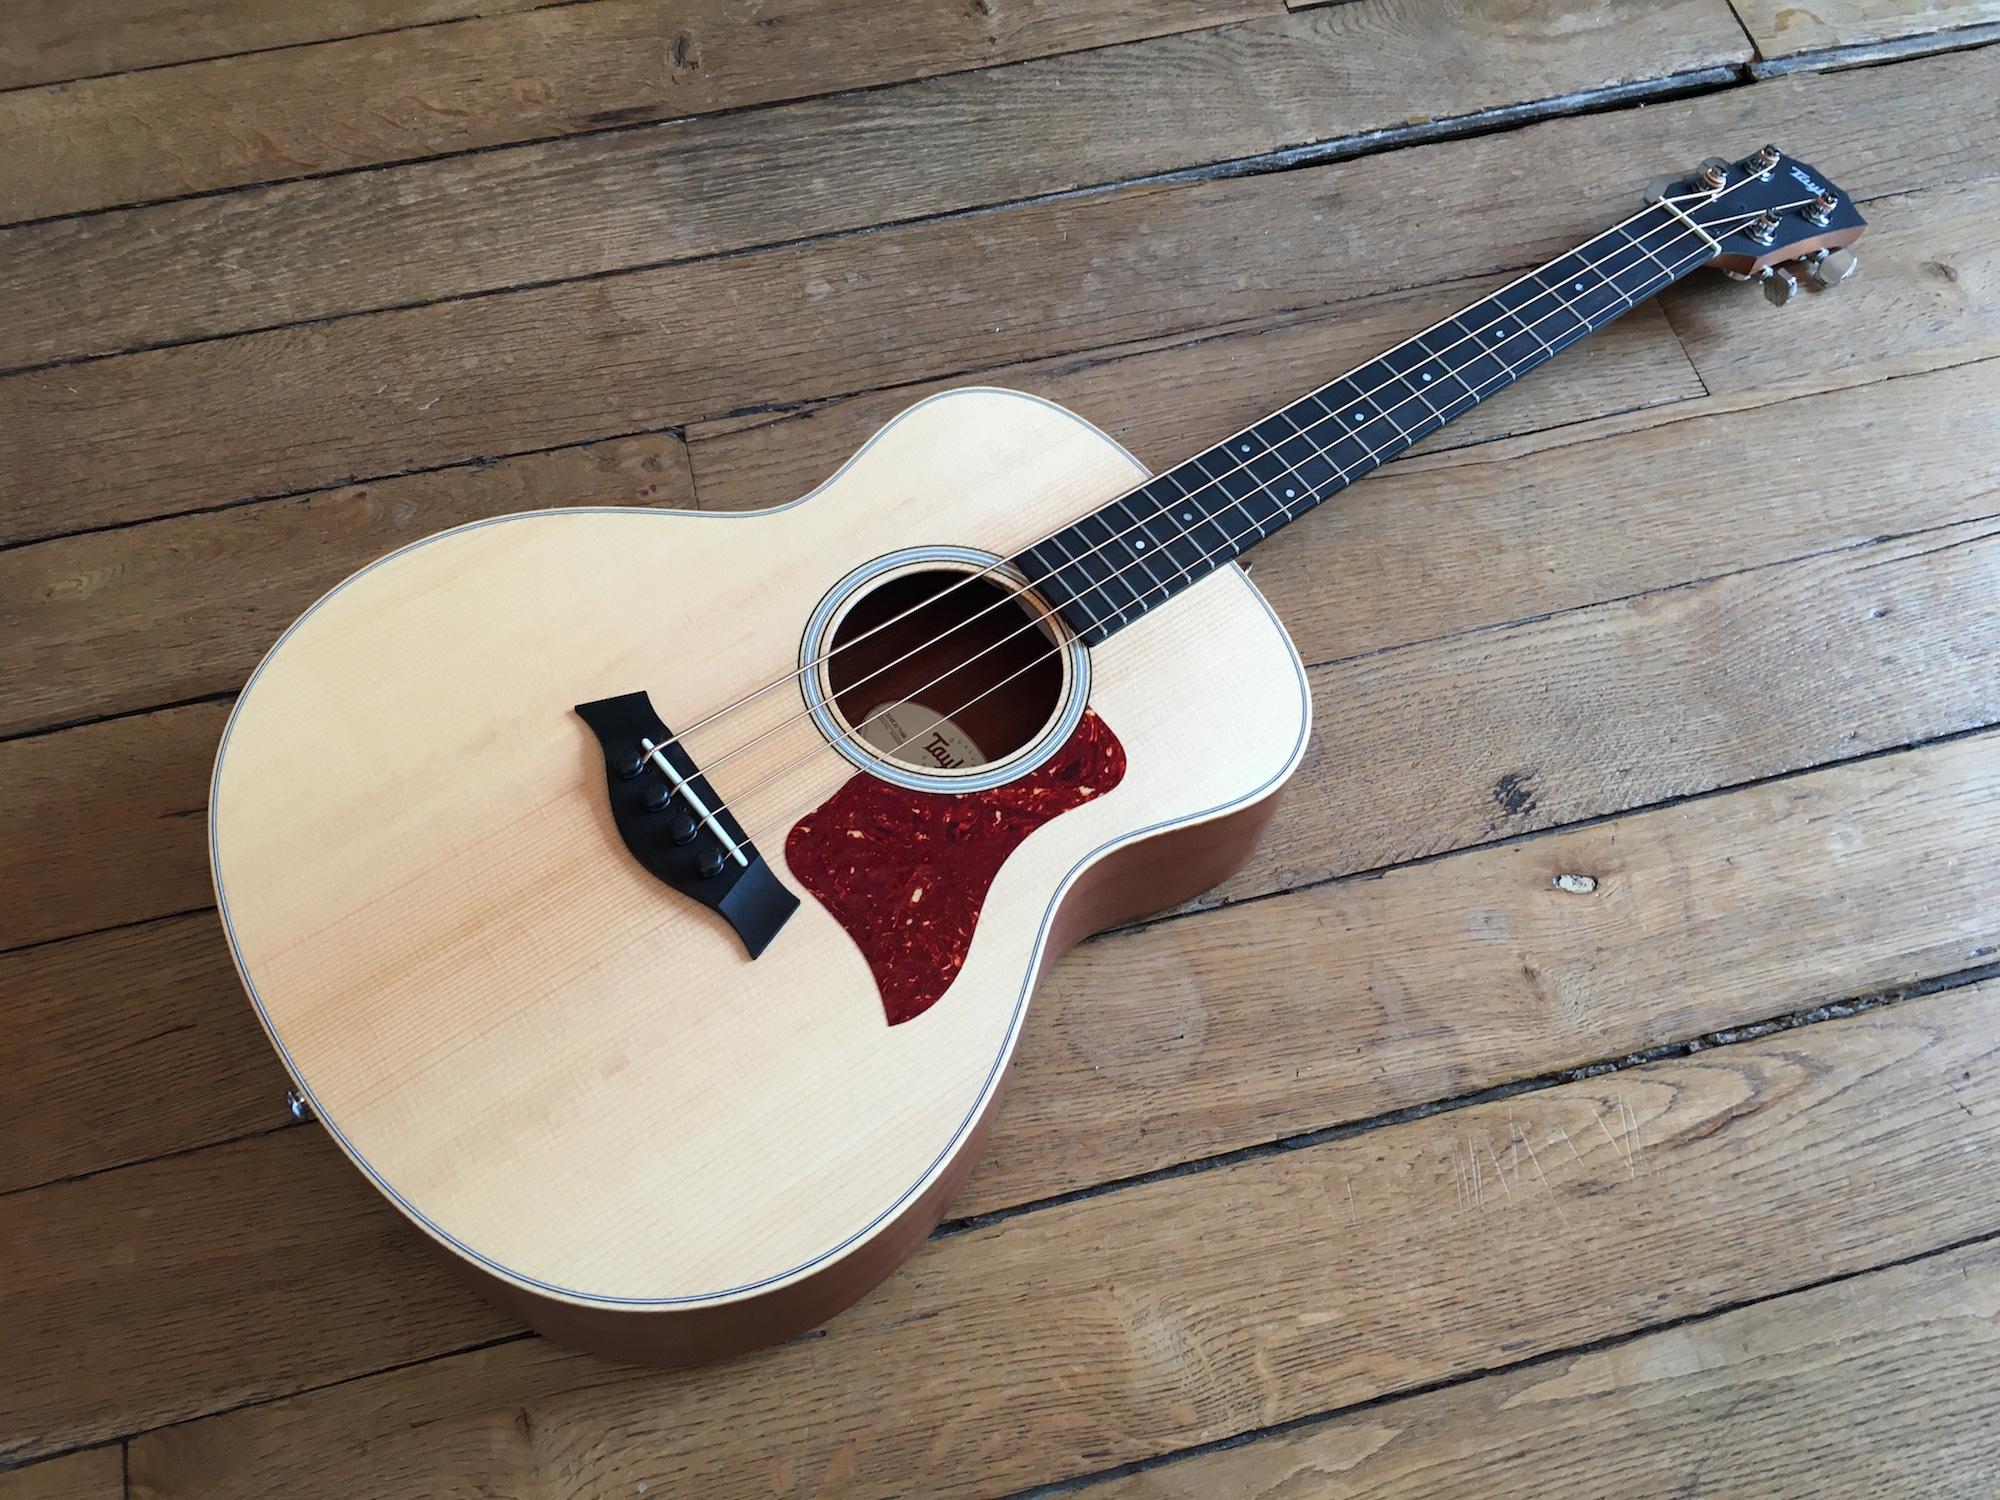 Test Guitare - GS Mini Bass @TaylorGuitars : mini instrument, maxi son !